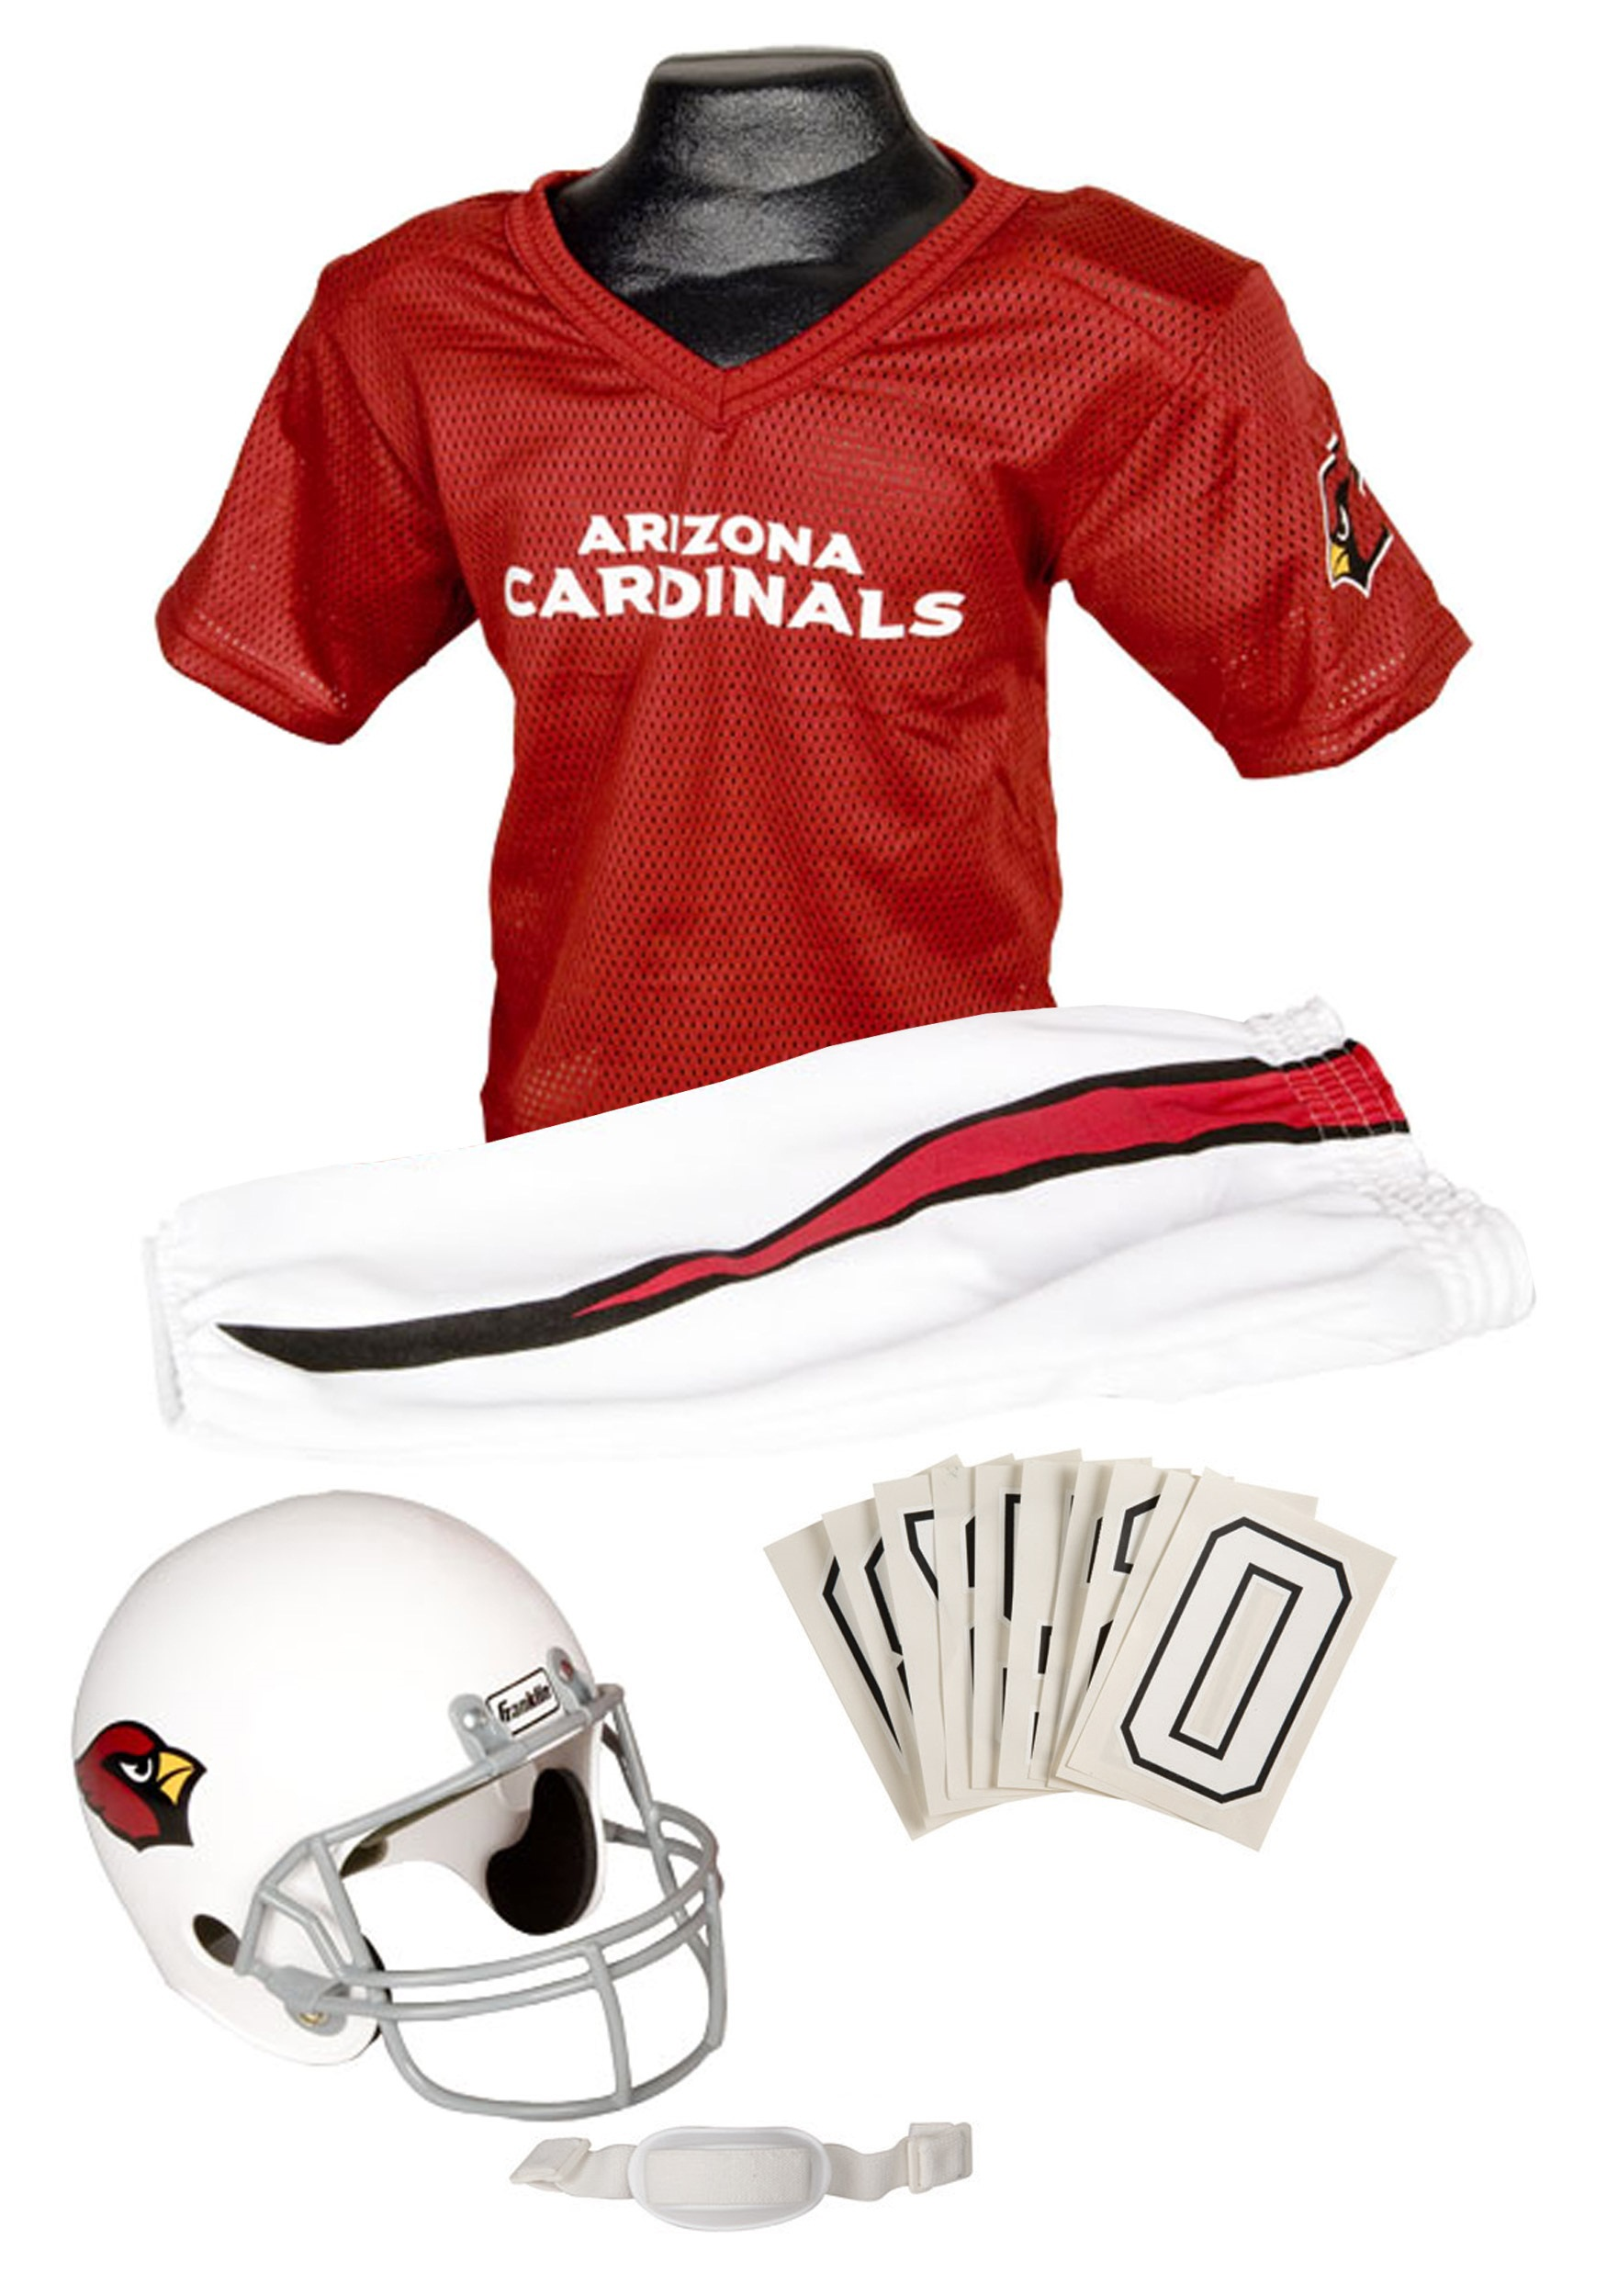 Kids NFL Cardinals Uniform Costume FA15700F11